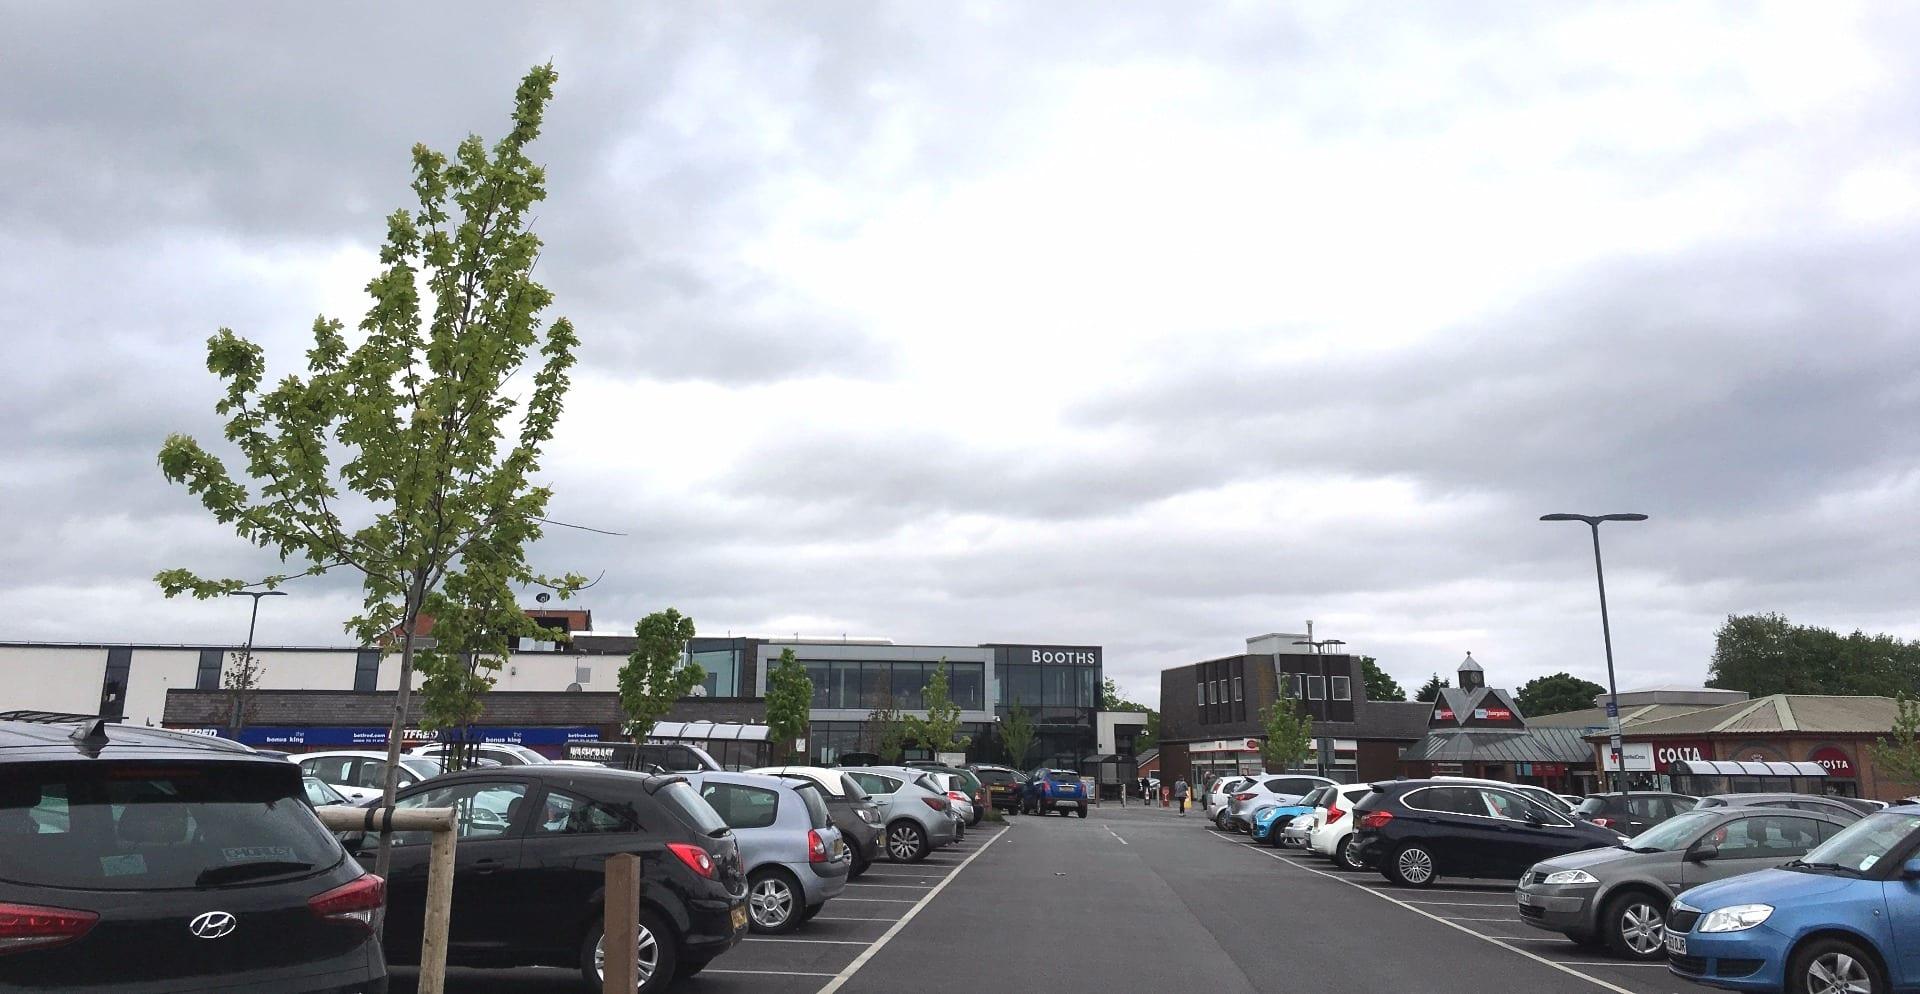 Poulton Teanlowe Car Park